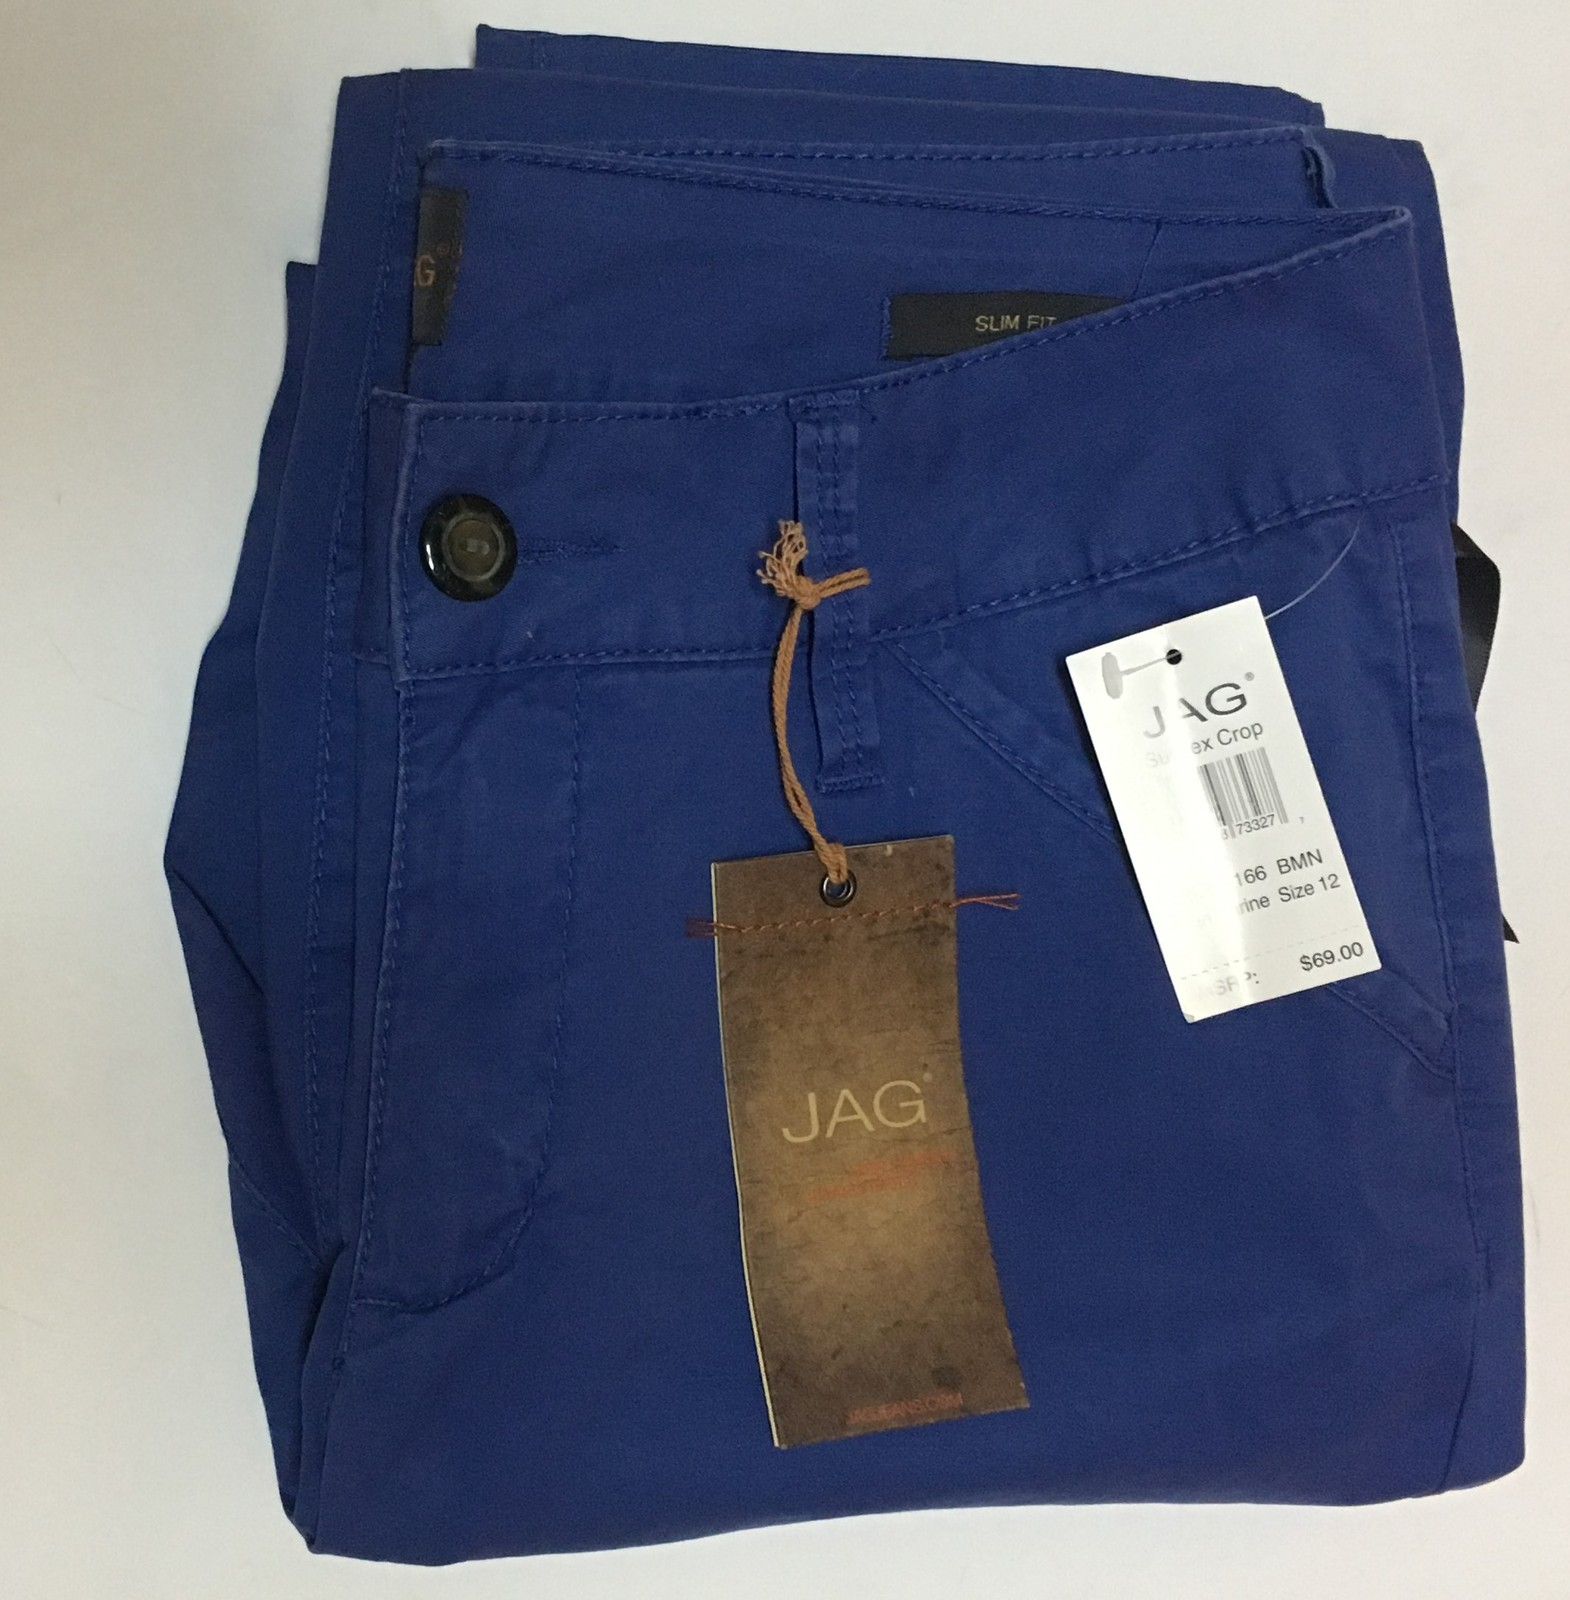 Nordstrom JAG Slim Fit Capri Pants Blue Marine Sz 12 NEW